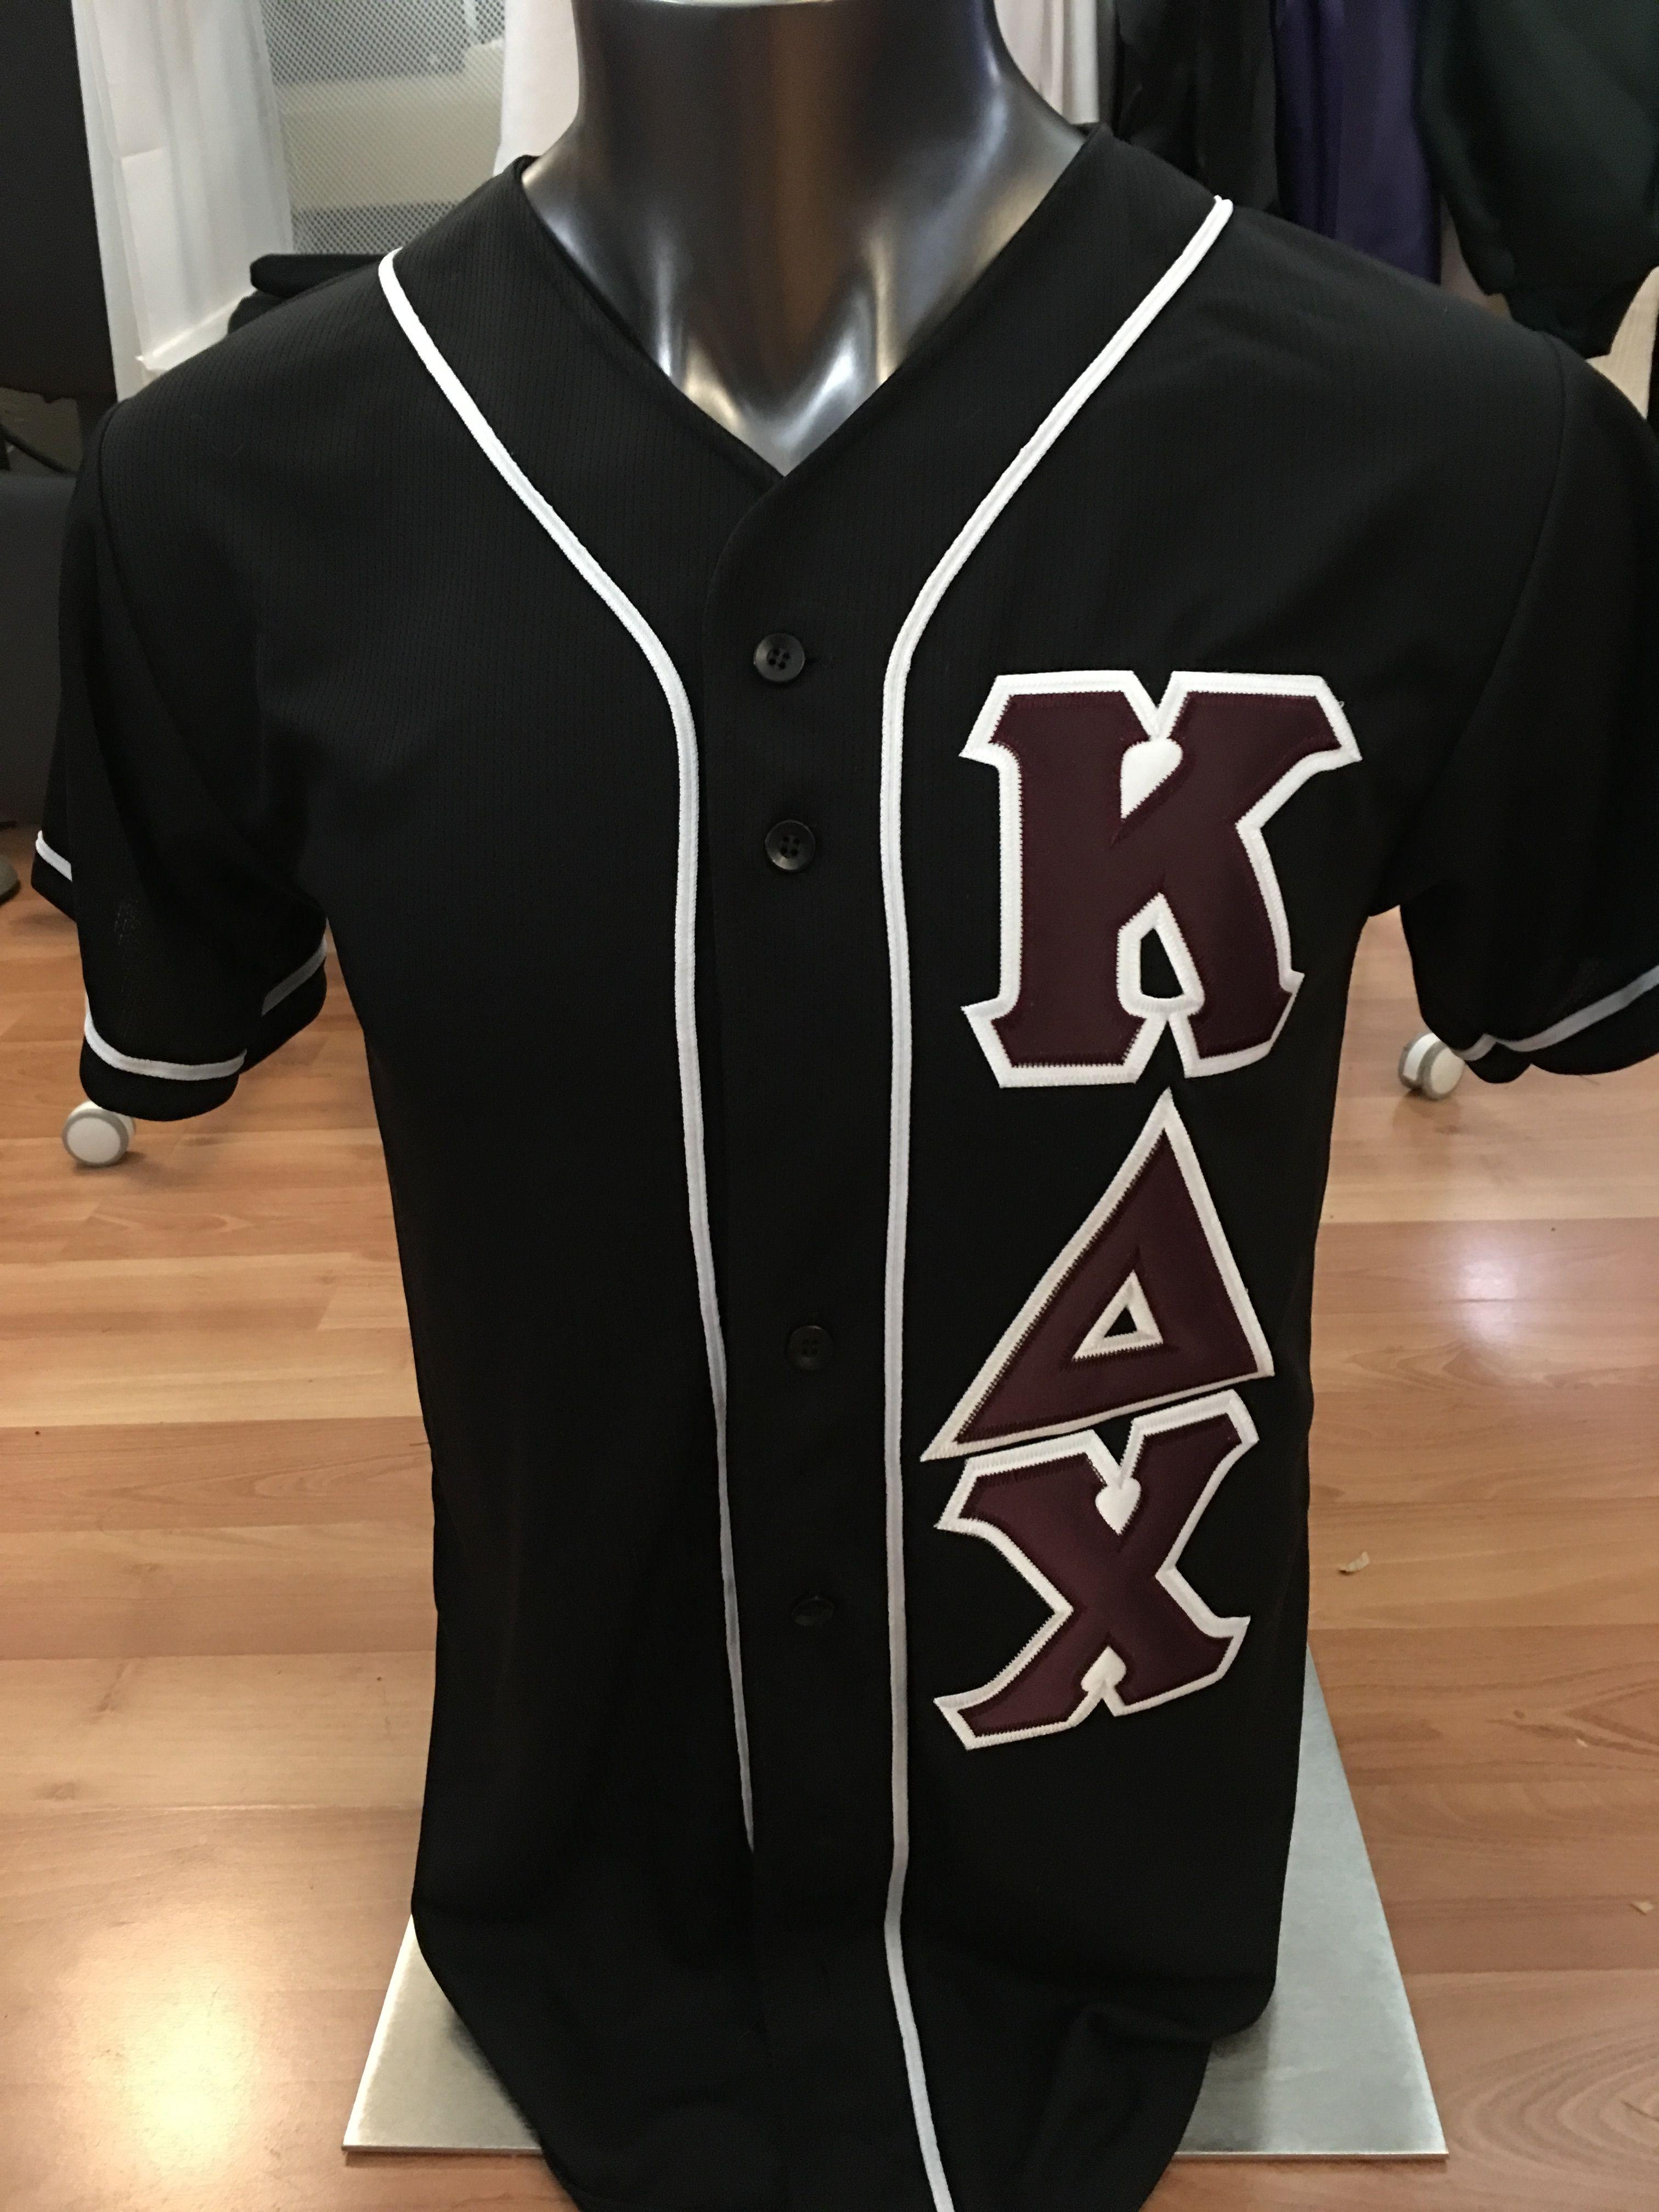 5779a6afba Kappa Delta Chi Baseball Jersey | Kappa Delta Chi | Kappa delta chi ...